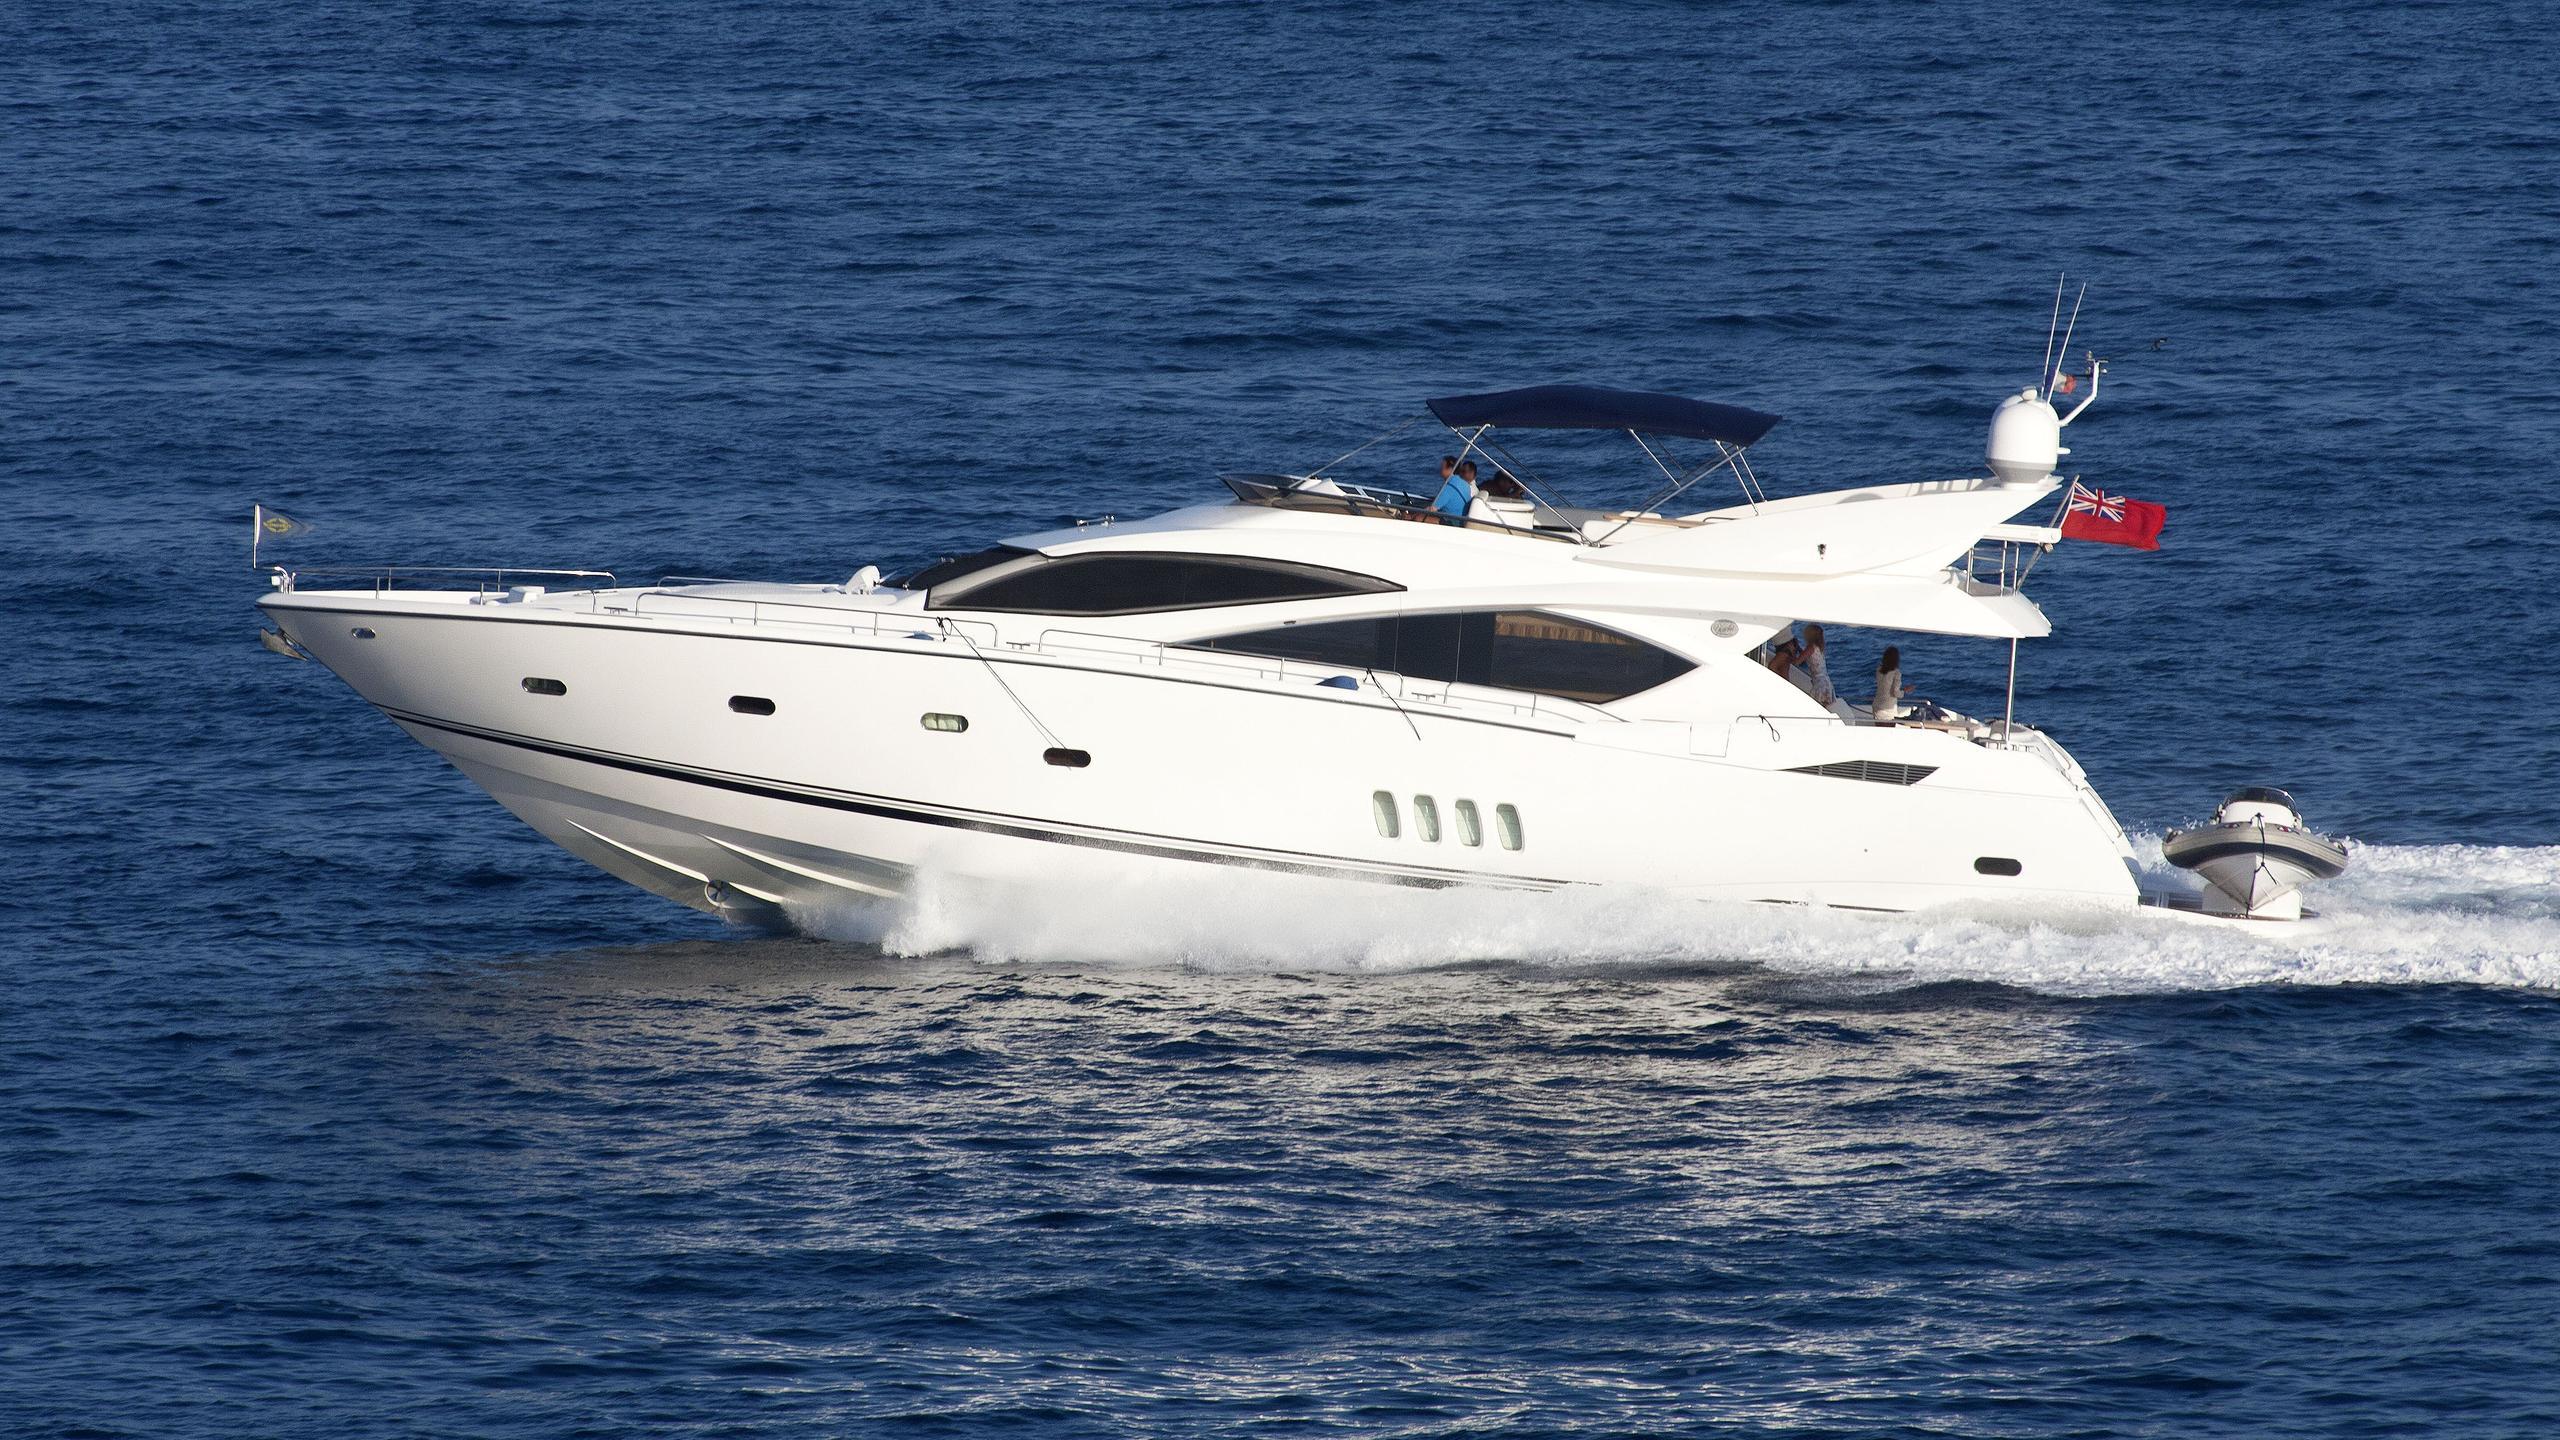 lady-doris-white-gold-motoryacht-sunseeker-82-yacht-2006-25m-profile-running